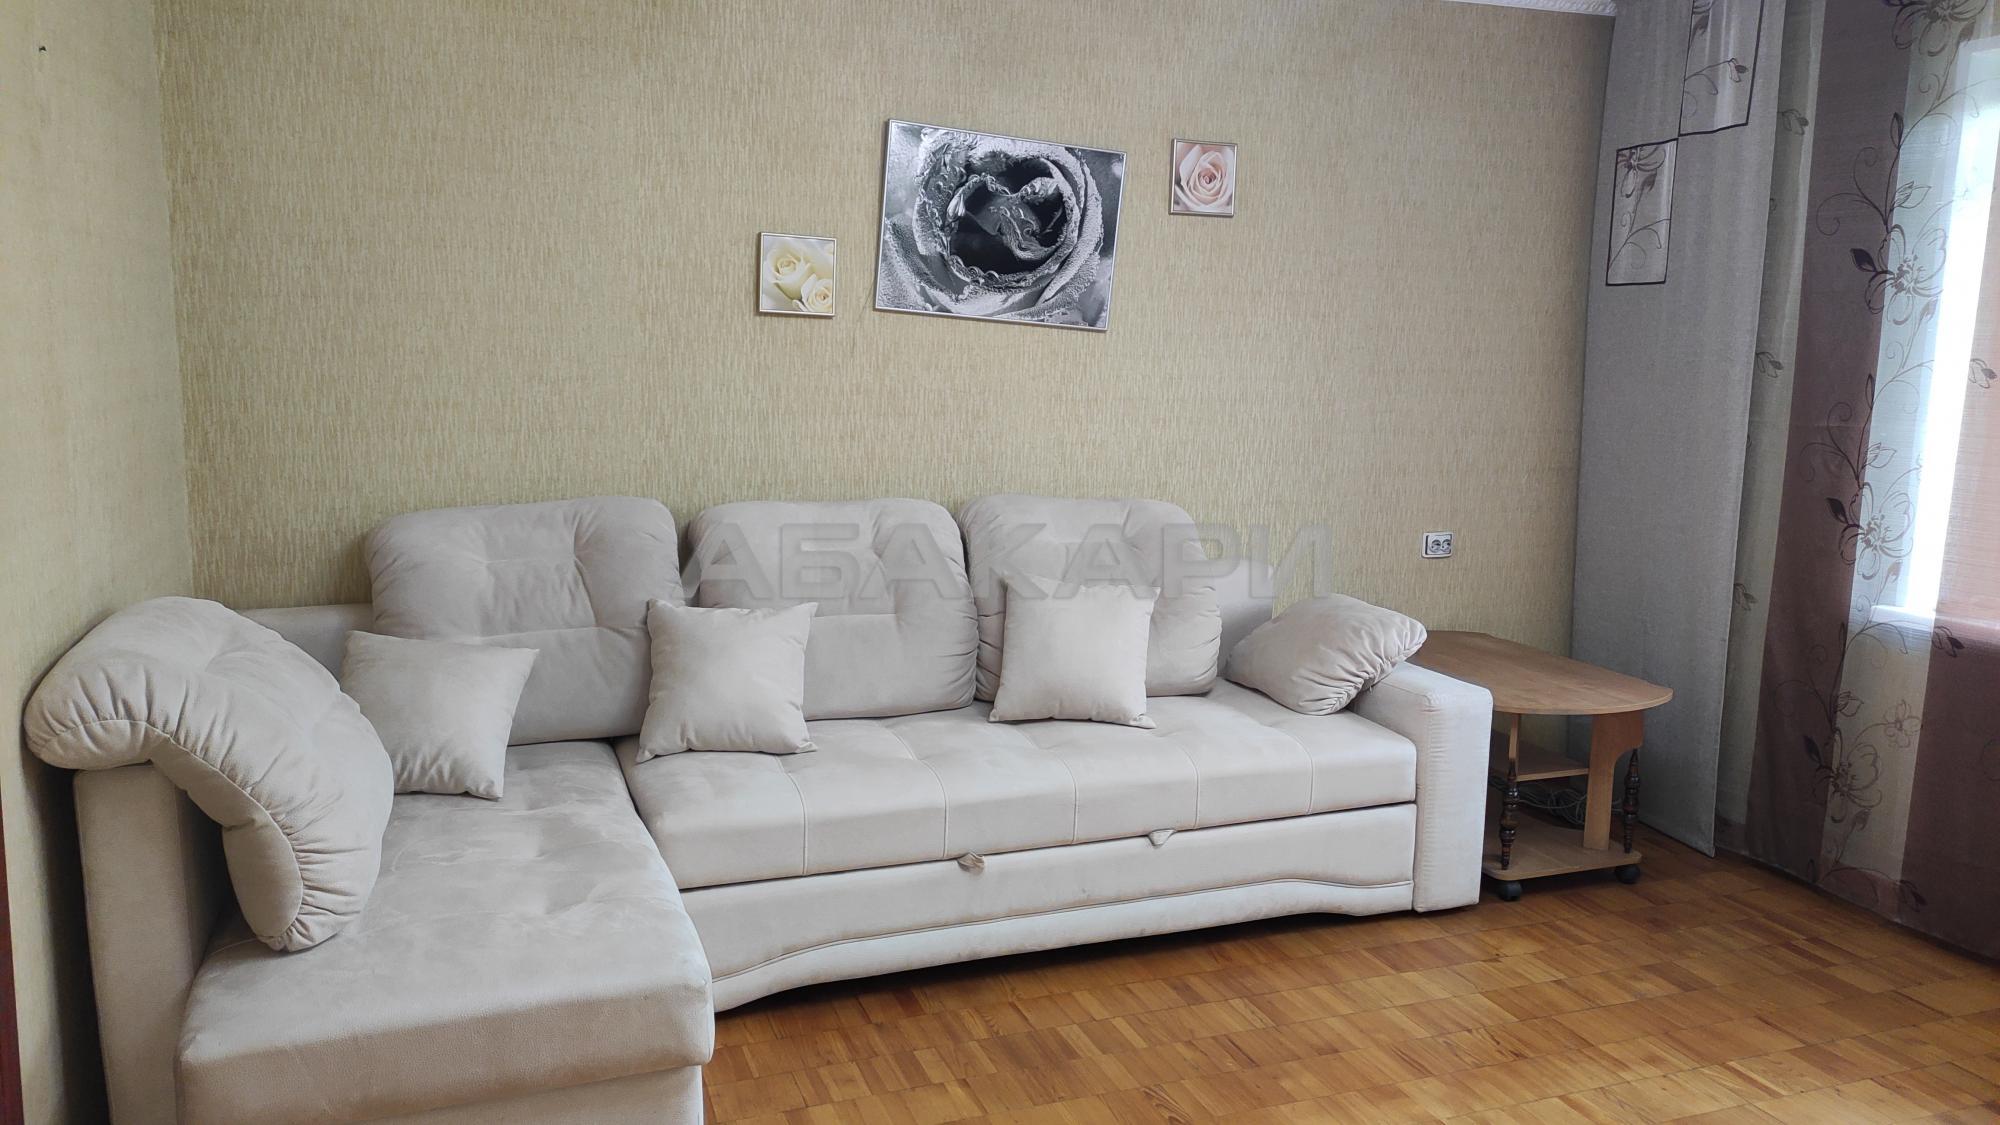 2к квартира проспект Металлургов, 30 1/9 - 53кв | 22000 | аренда в Красноярске фото 1